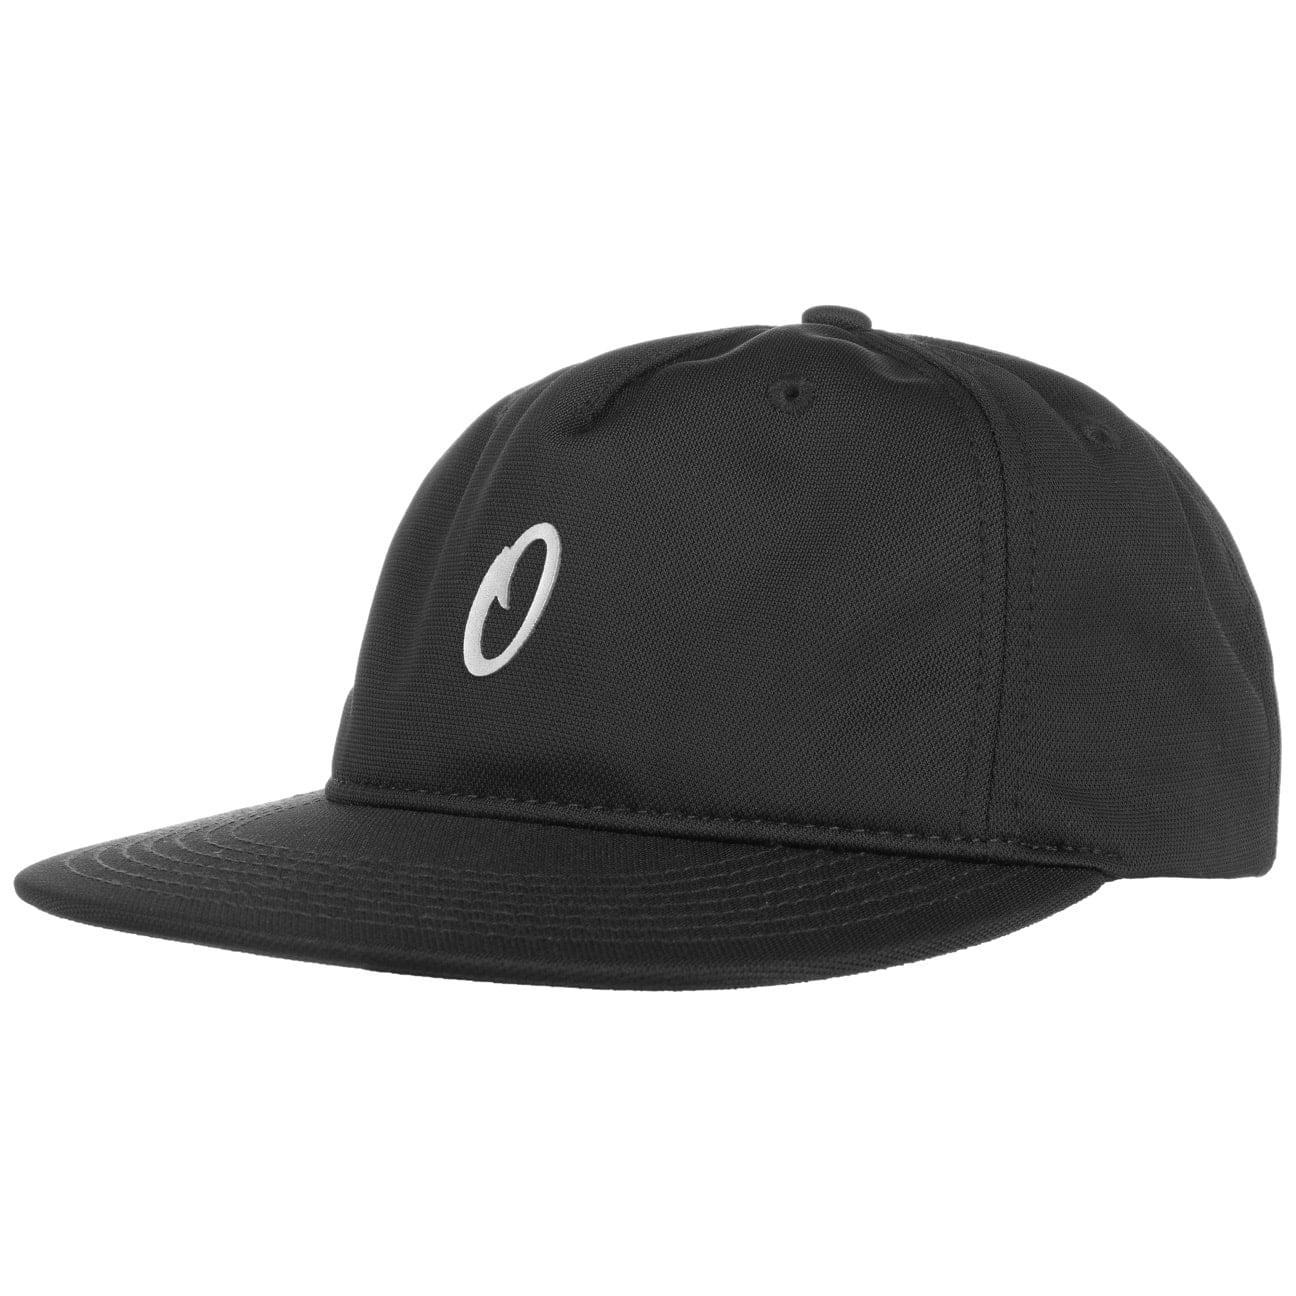 Casquette Air Luxe by Official Headwear  baseball cap